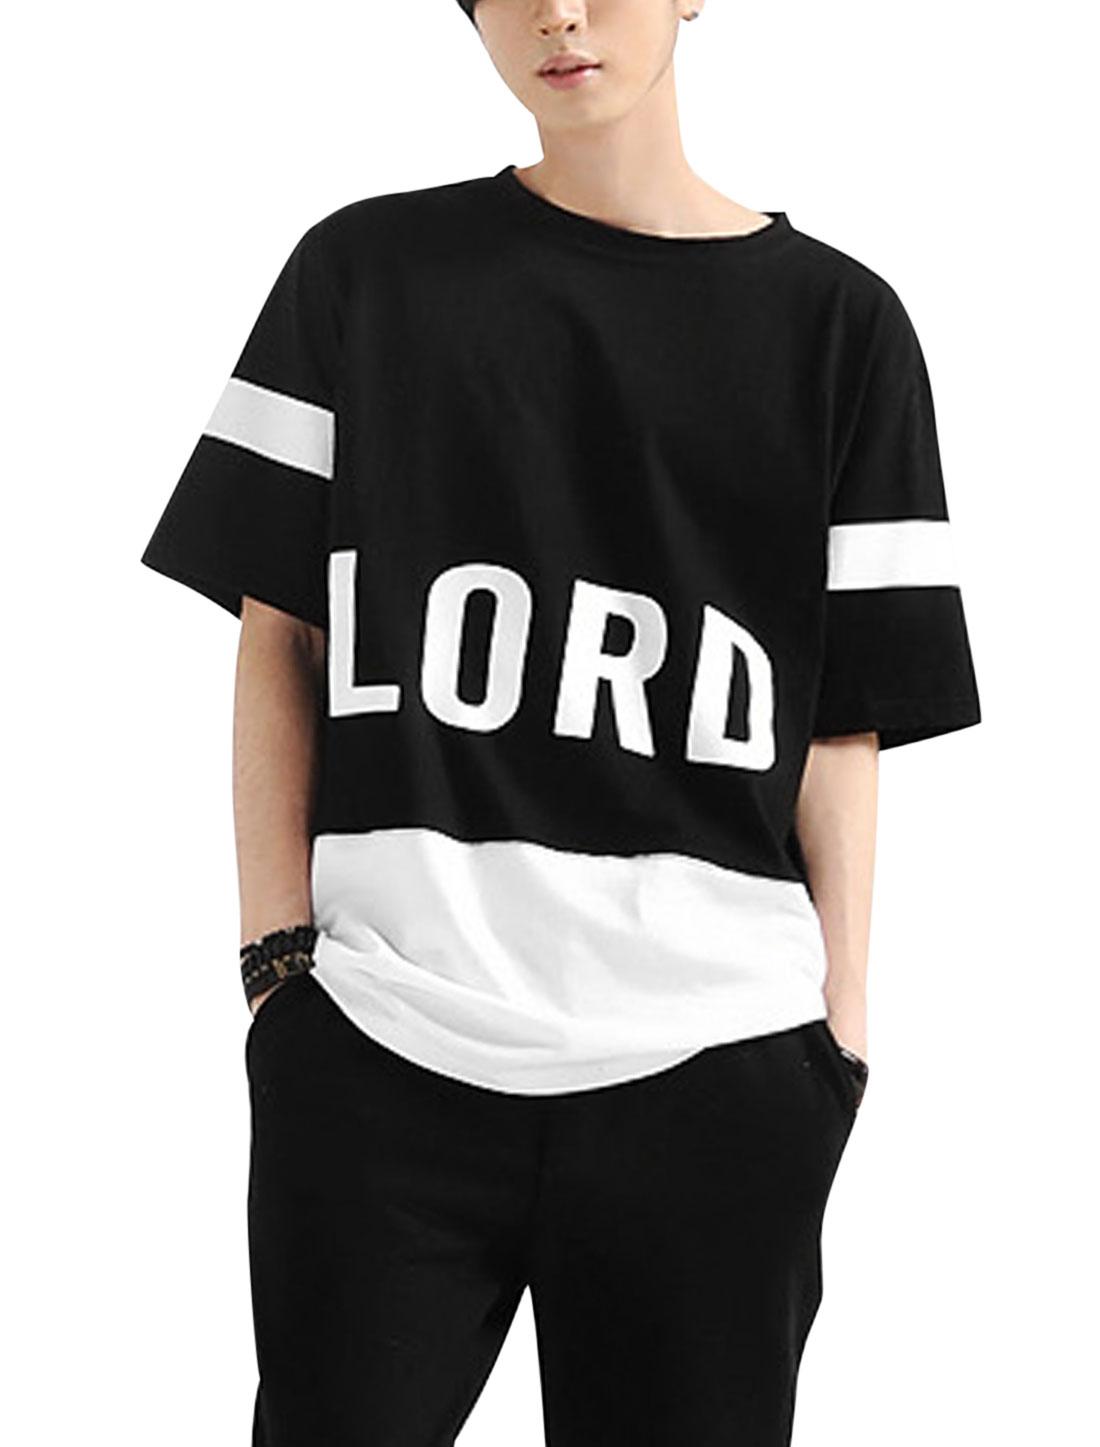 Men Round Neck Letters Pattern Color Block Casual Shirt Black White M